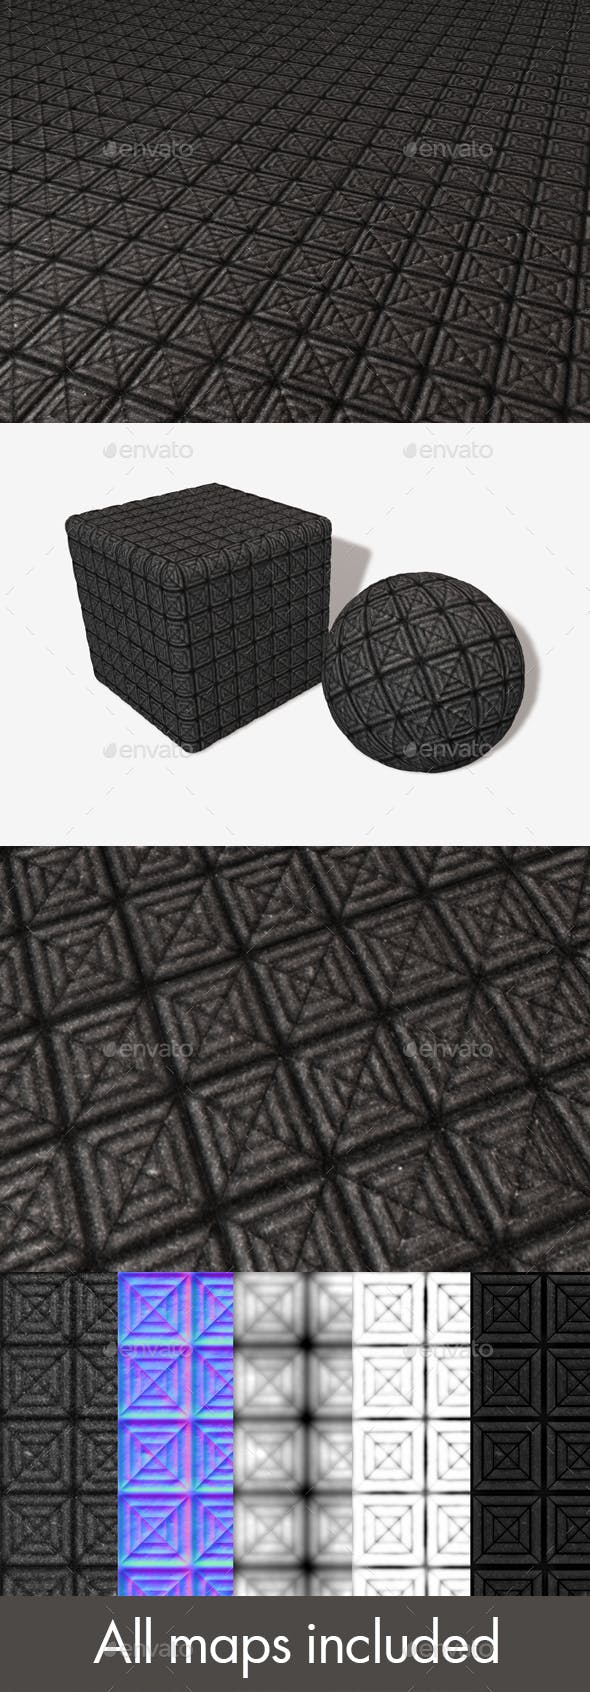 Entrance Tread Tiles Seamless Texture - 3DOcean Item for Sale